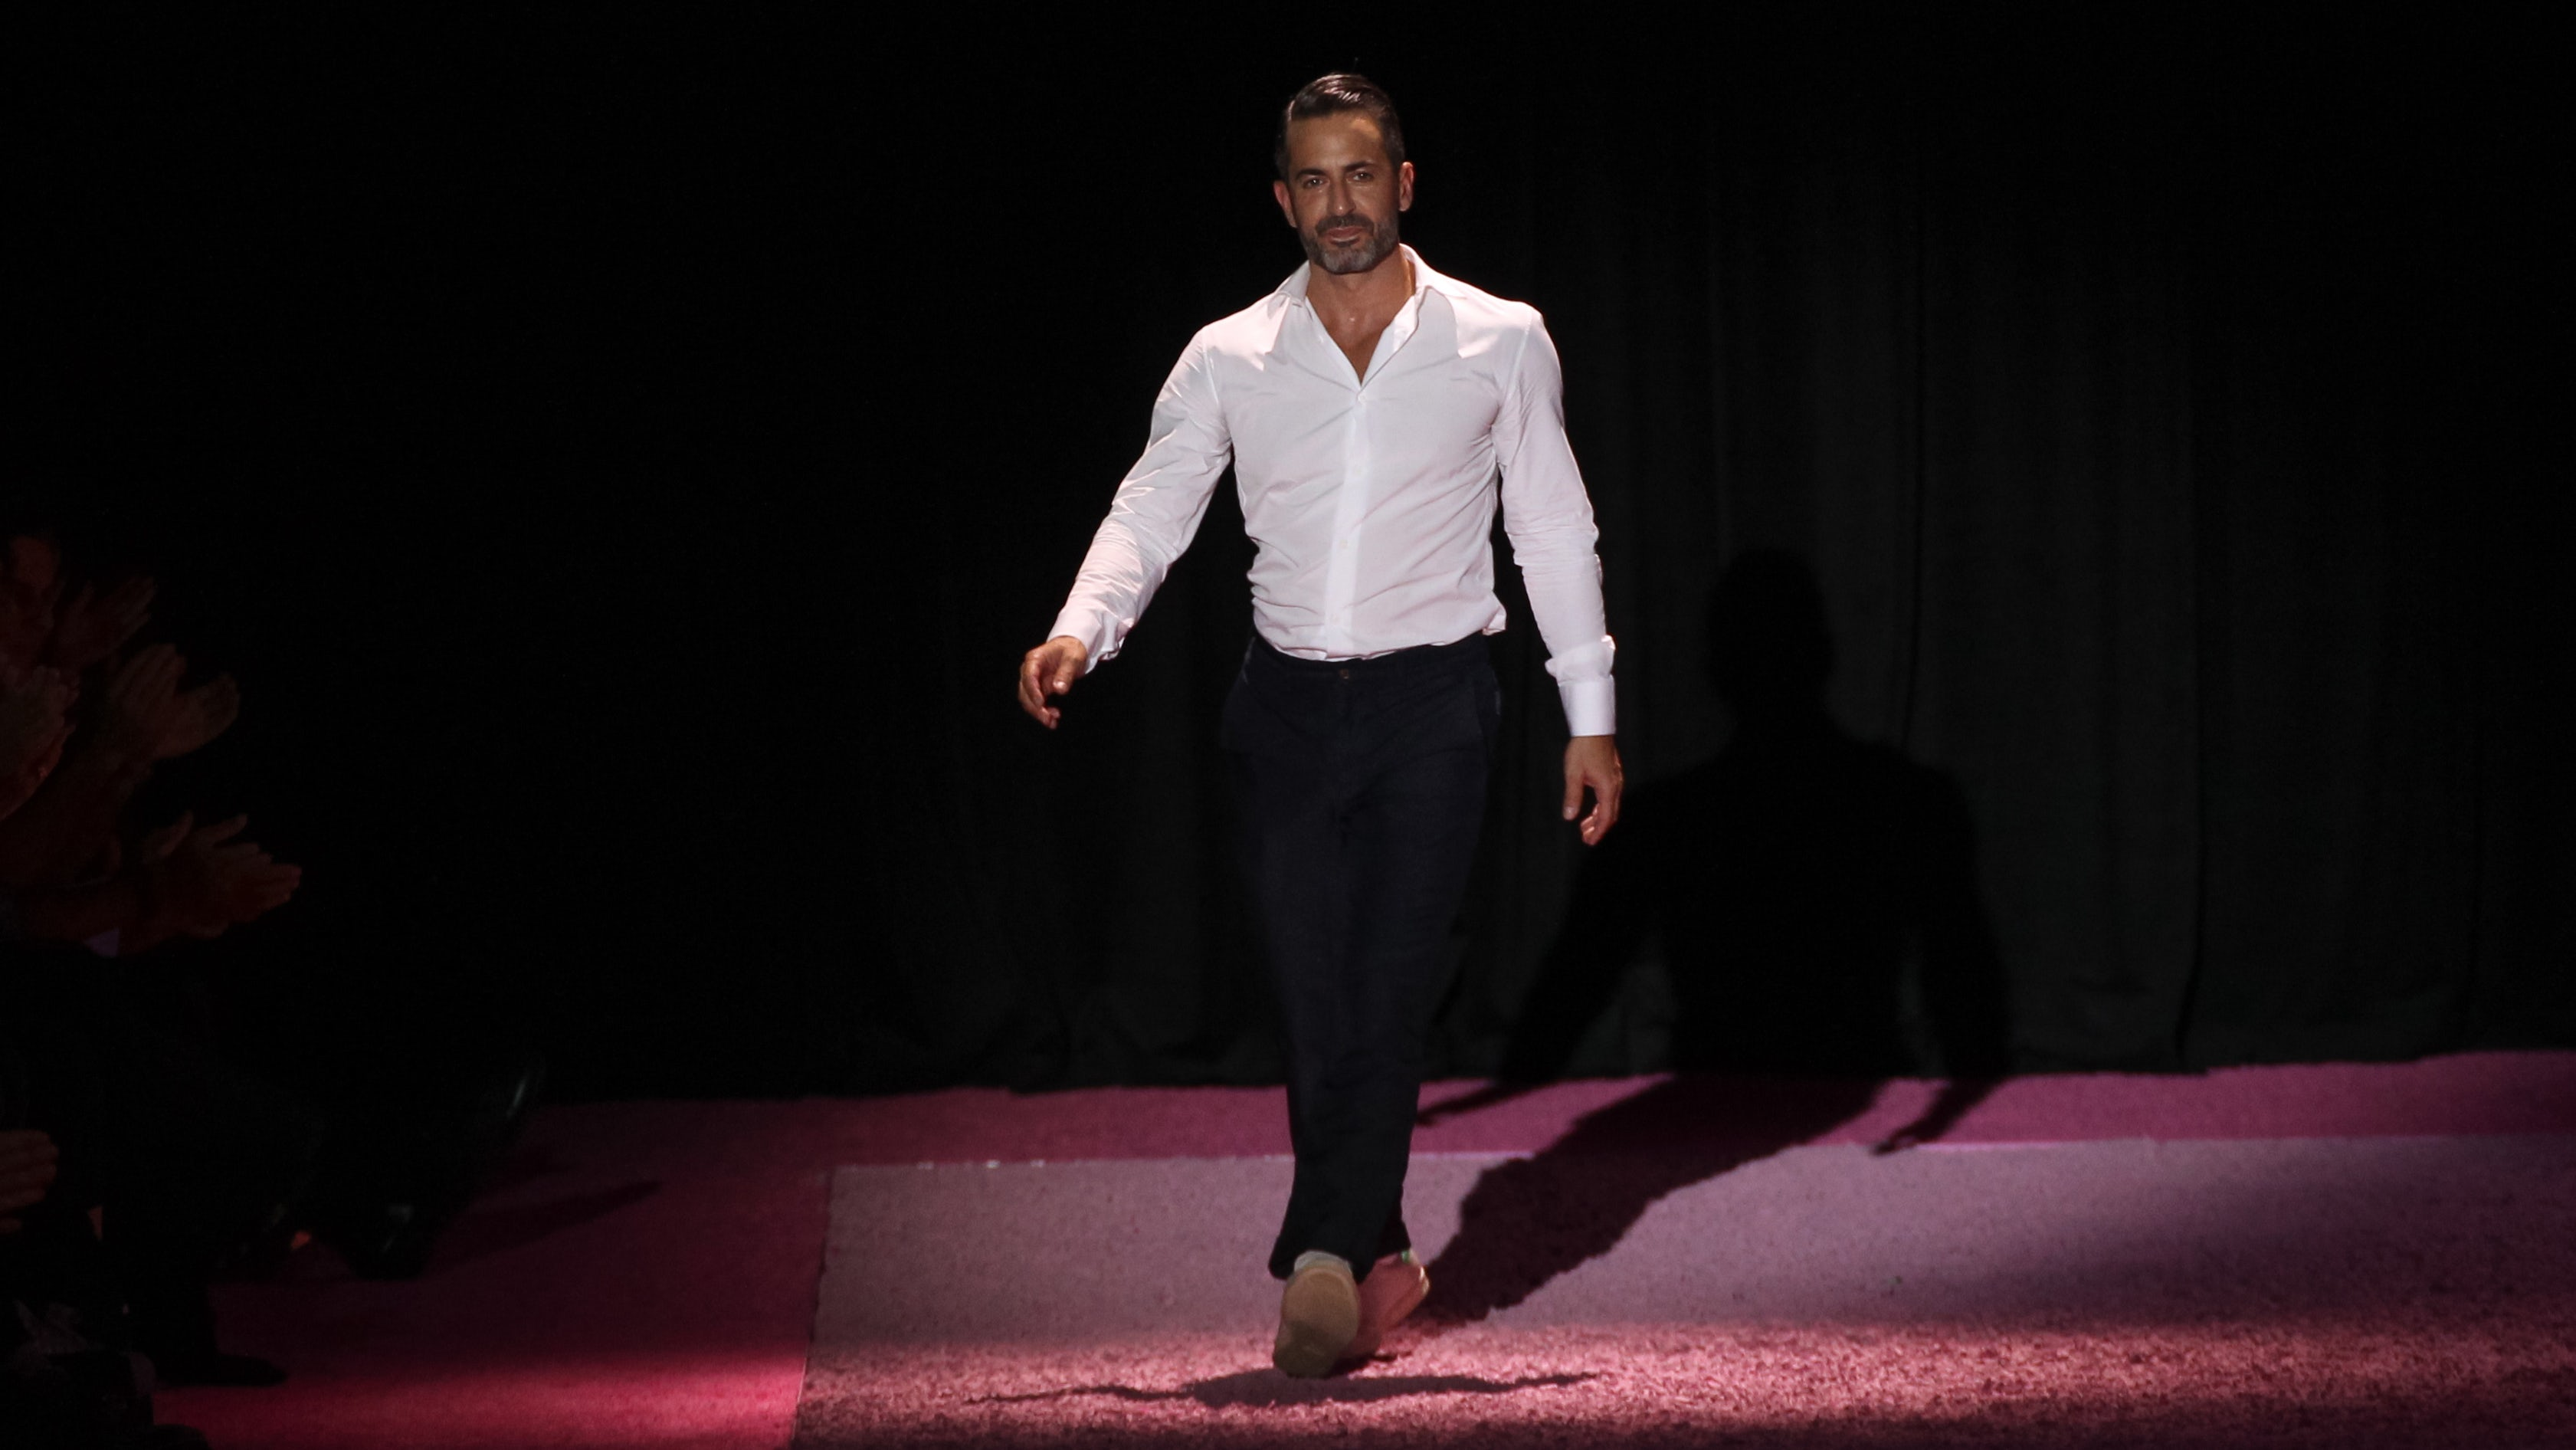 Marc Jacobs in 2015   Source: Shutterstock